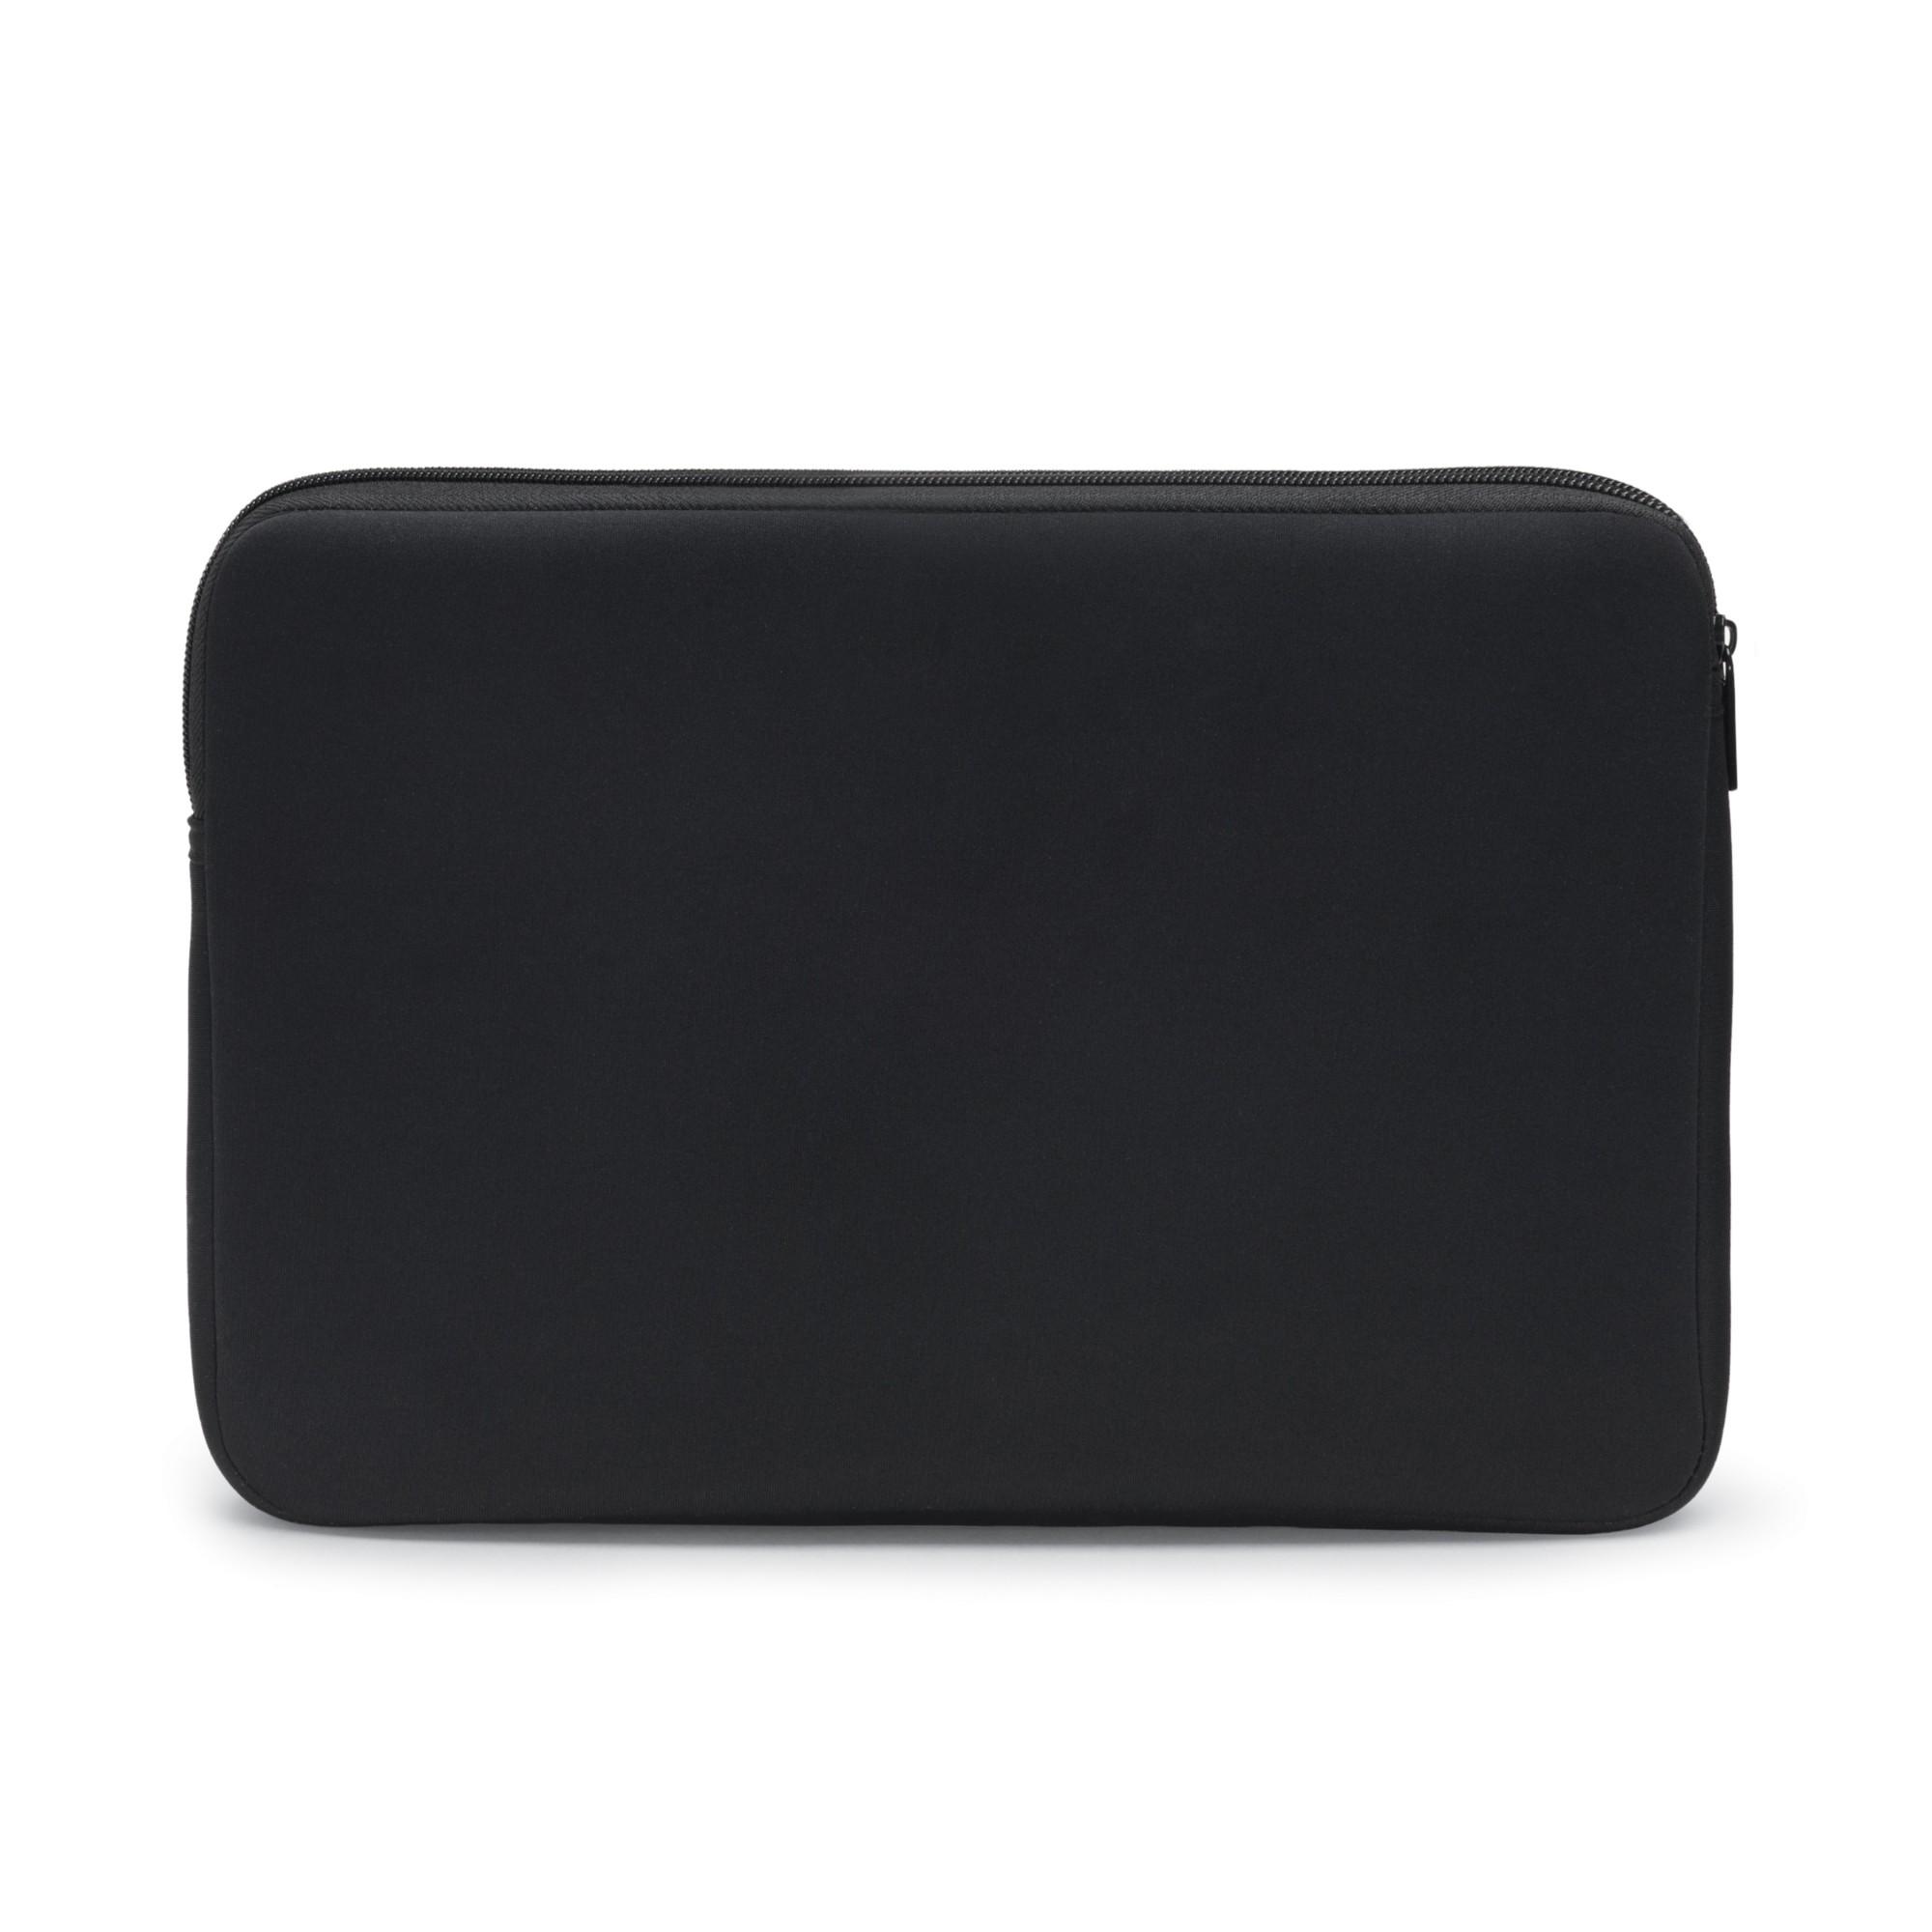 "Dicota Perfect Skin 15-15.6 39.6 cm (15.6"") Sleeve case Black"